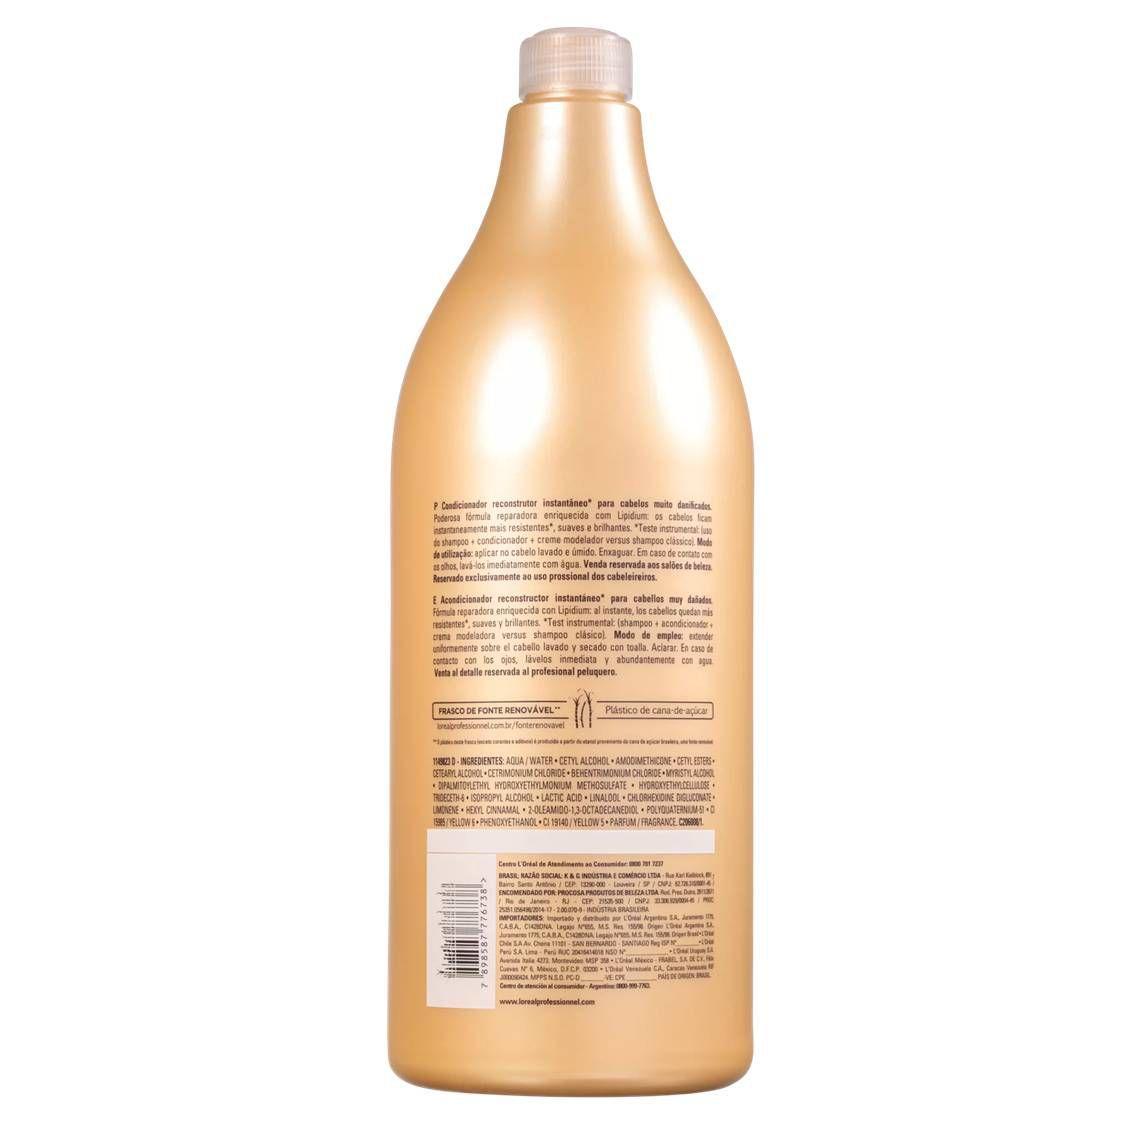 Condicionador Loréal Absolut Repair 1500 ml - Reparação absoluta